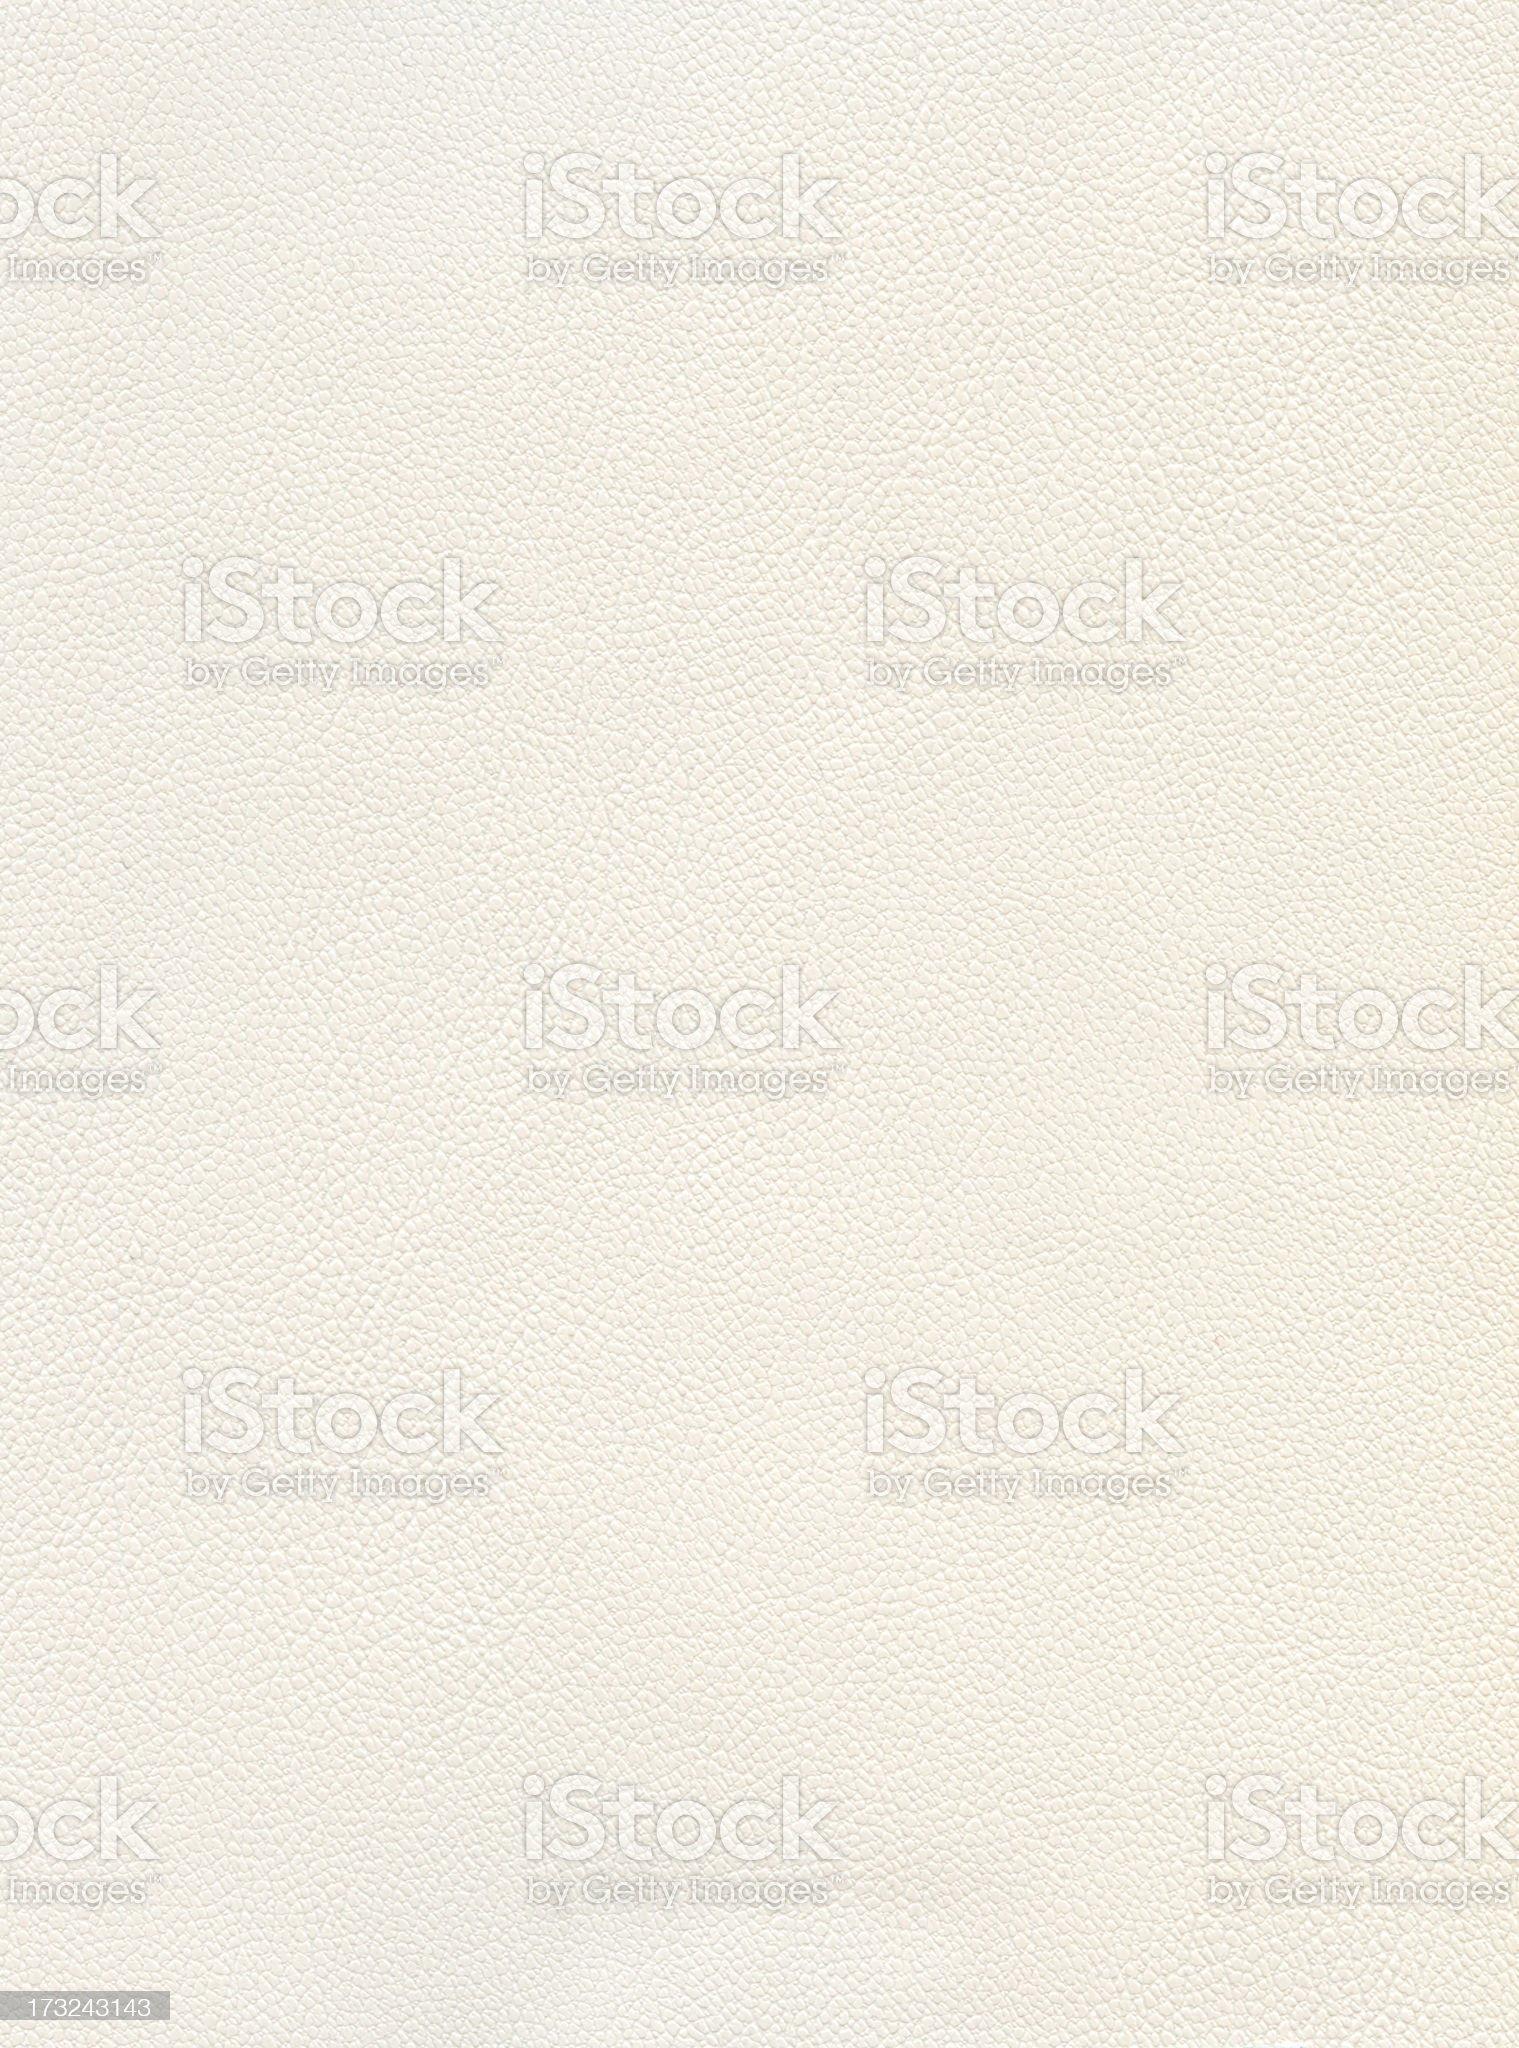 Leather background royalty-free stock photo